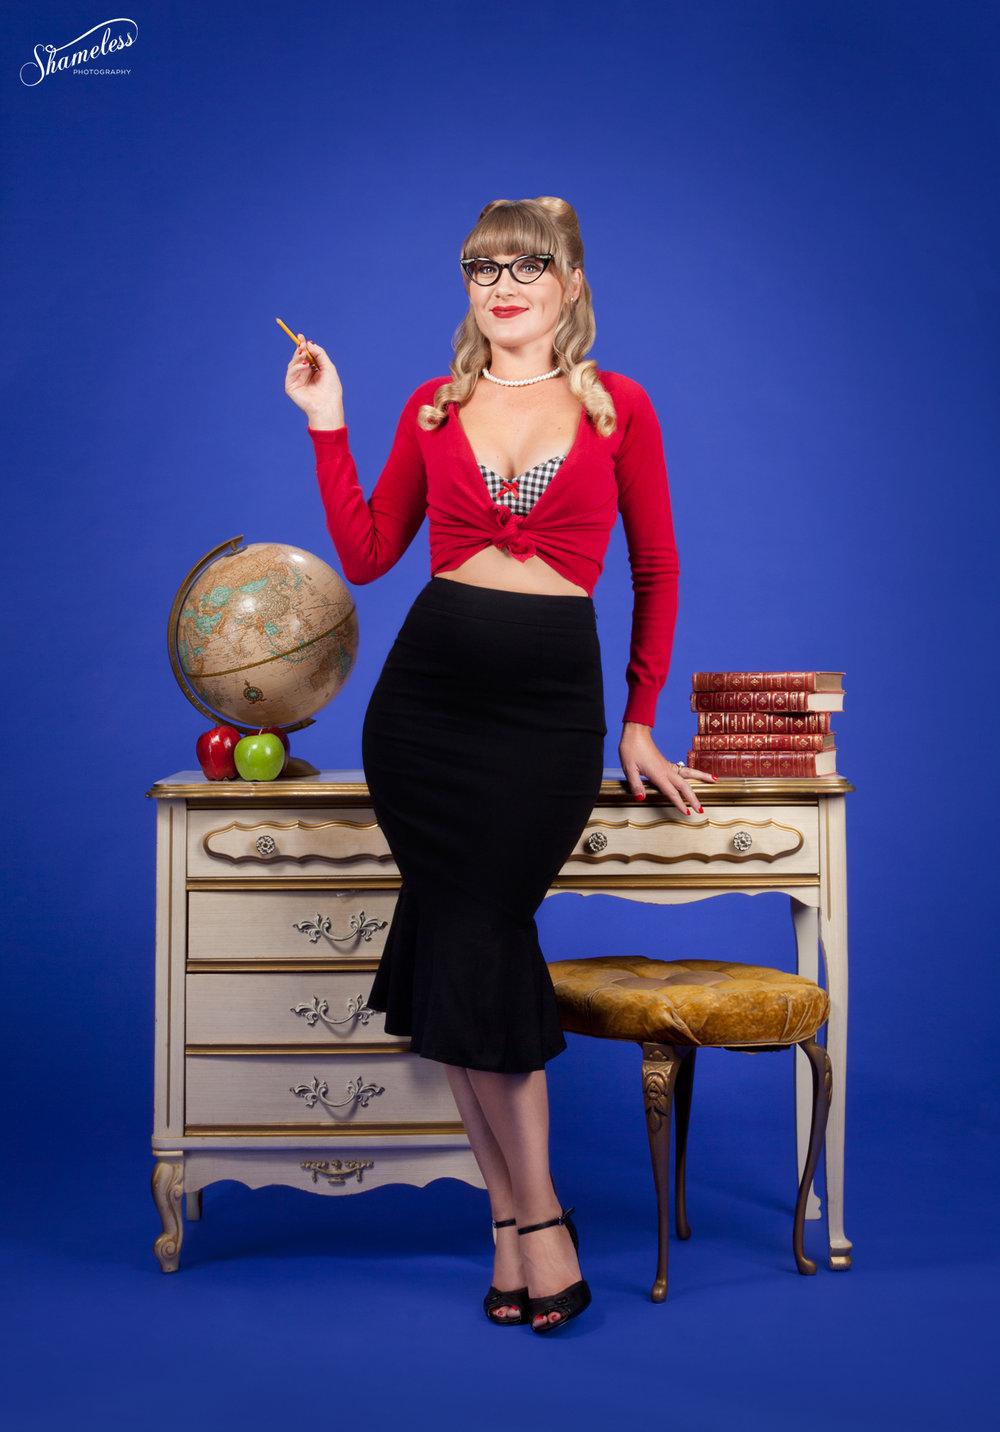 Carrie-WebReady-CareyLynne-12.jpg